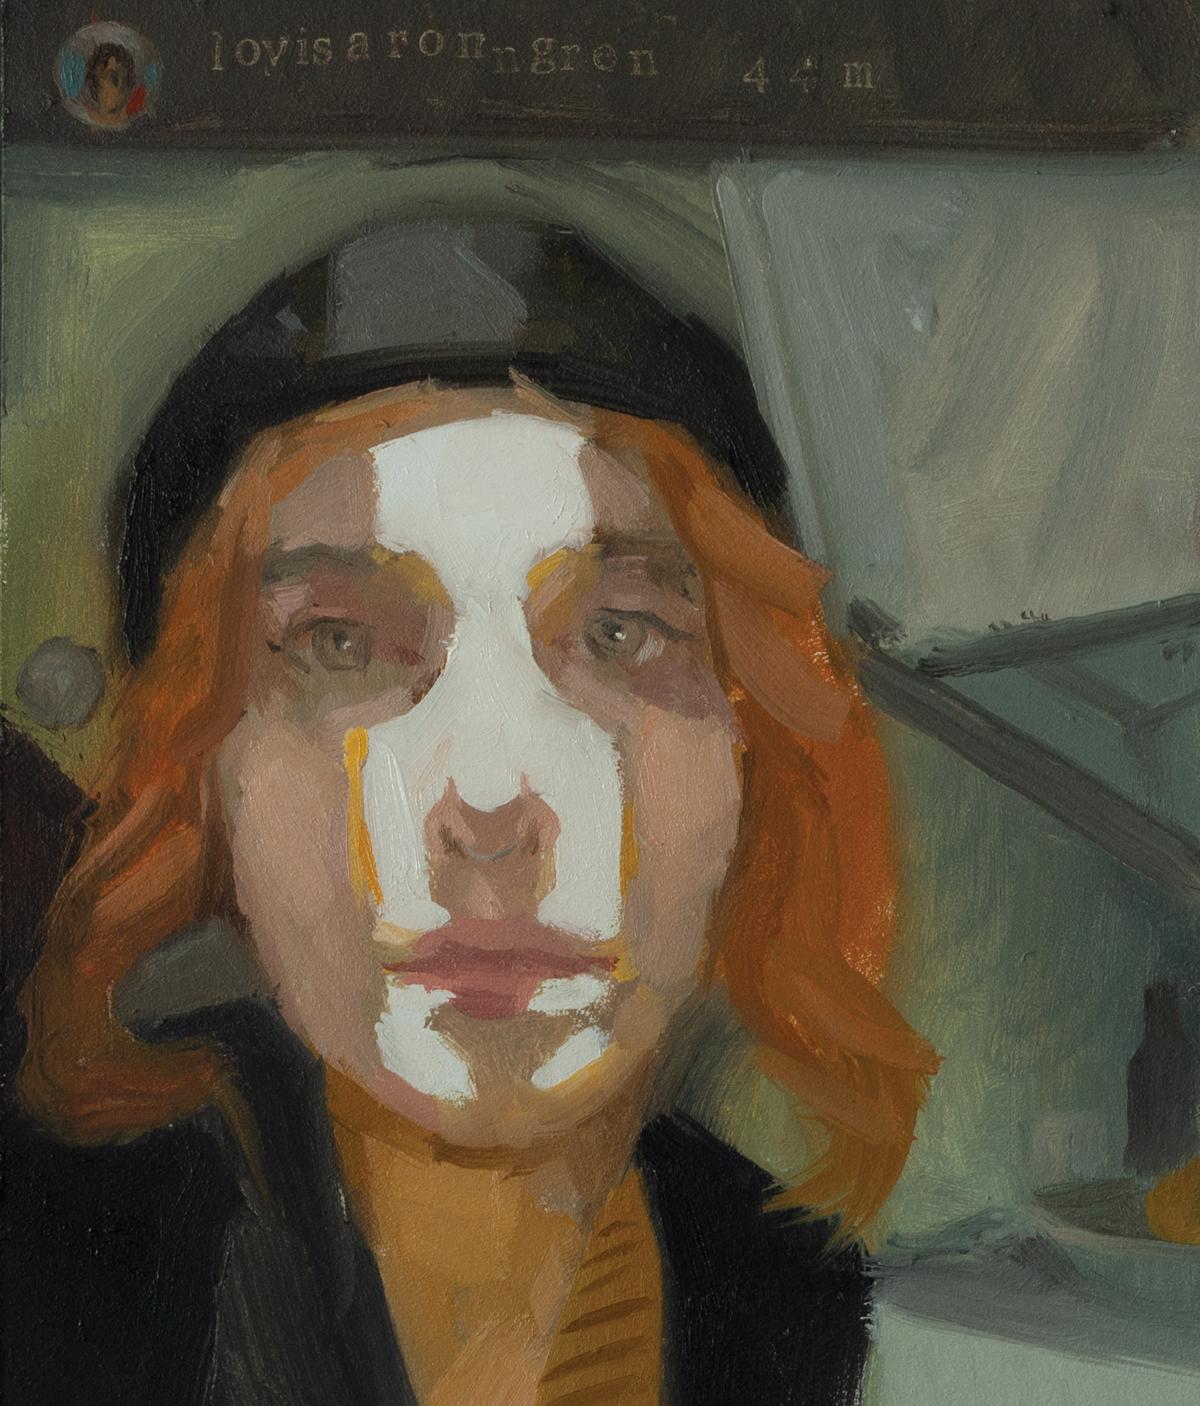 Thomas Golunski, <em>Lovisaronngren</em>, <br>20cm x 30 cm, Oil